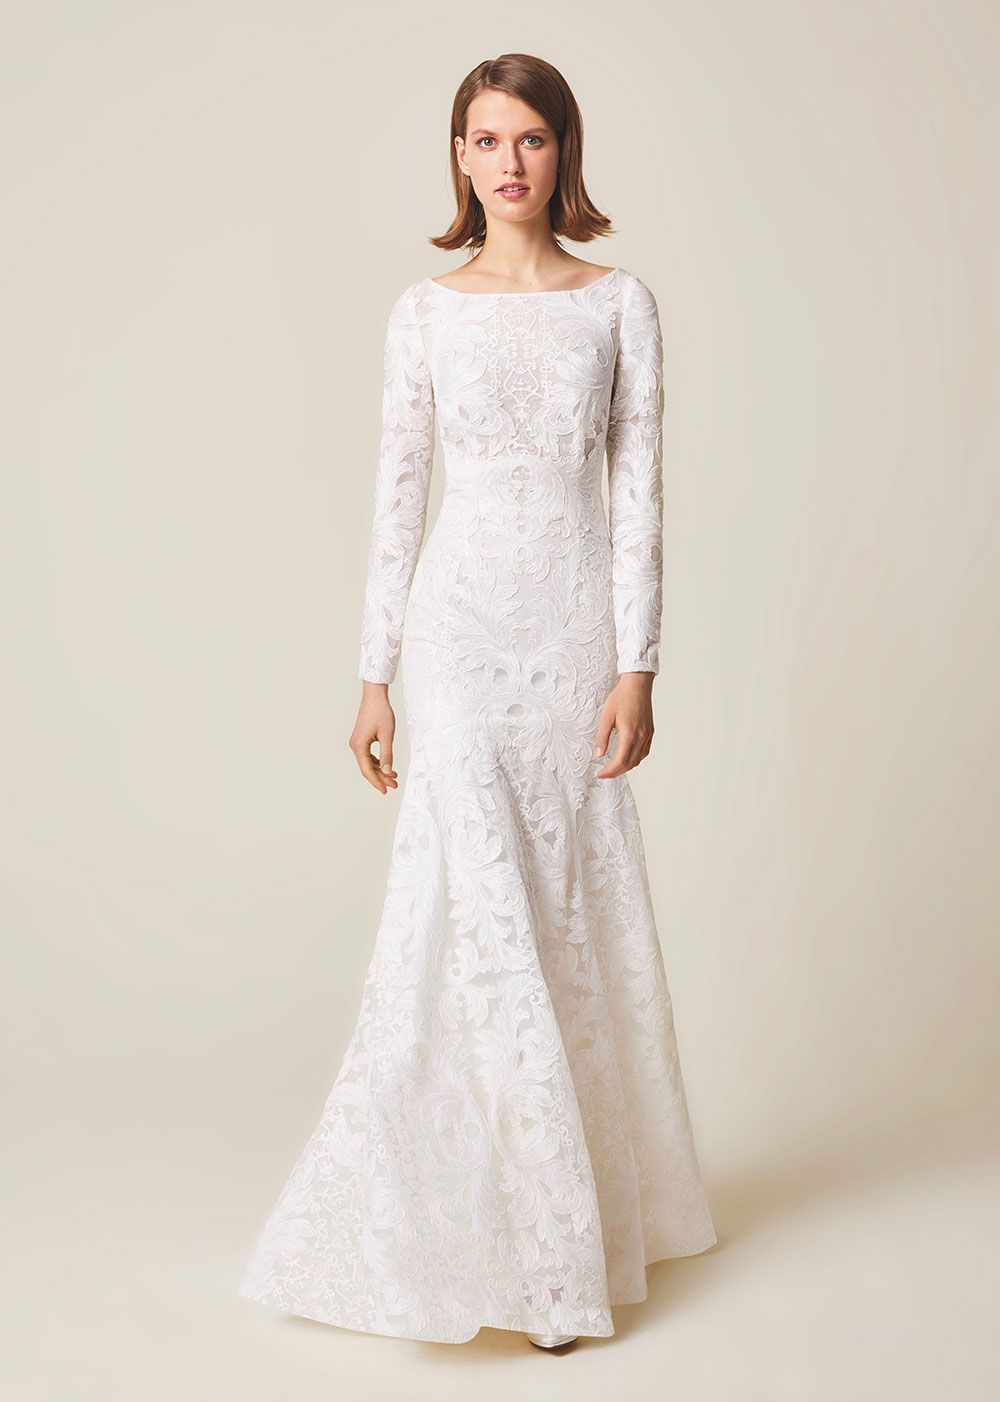 Silhouette wedding dresses simple bridal   unique lace full length long sleeve wedding dress Jesus Peiro